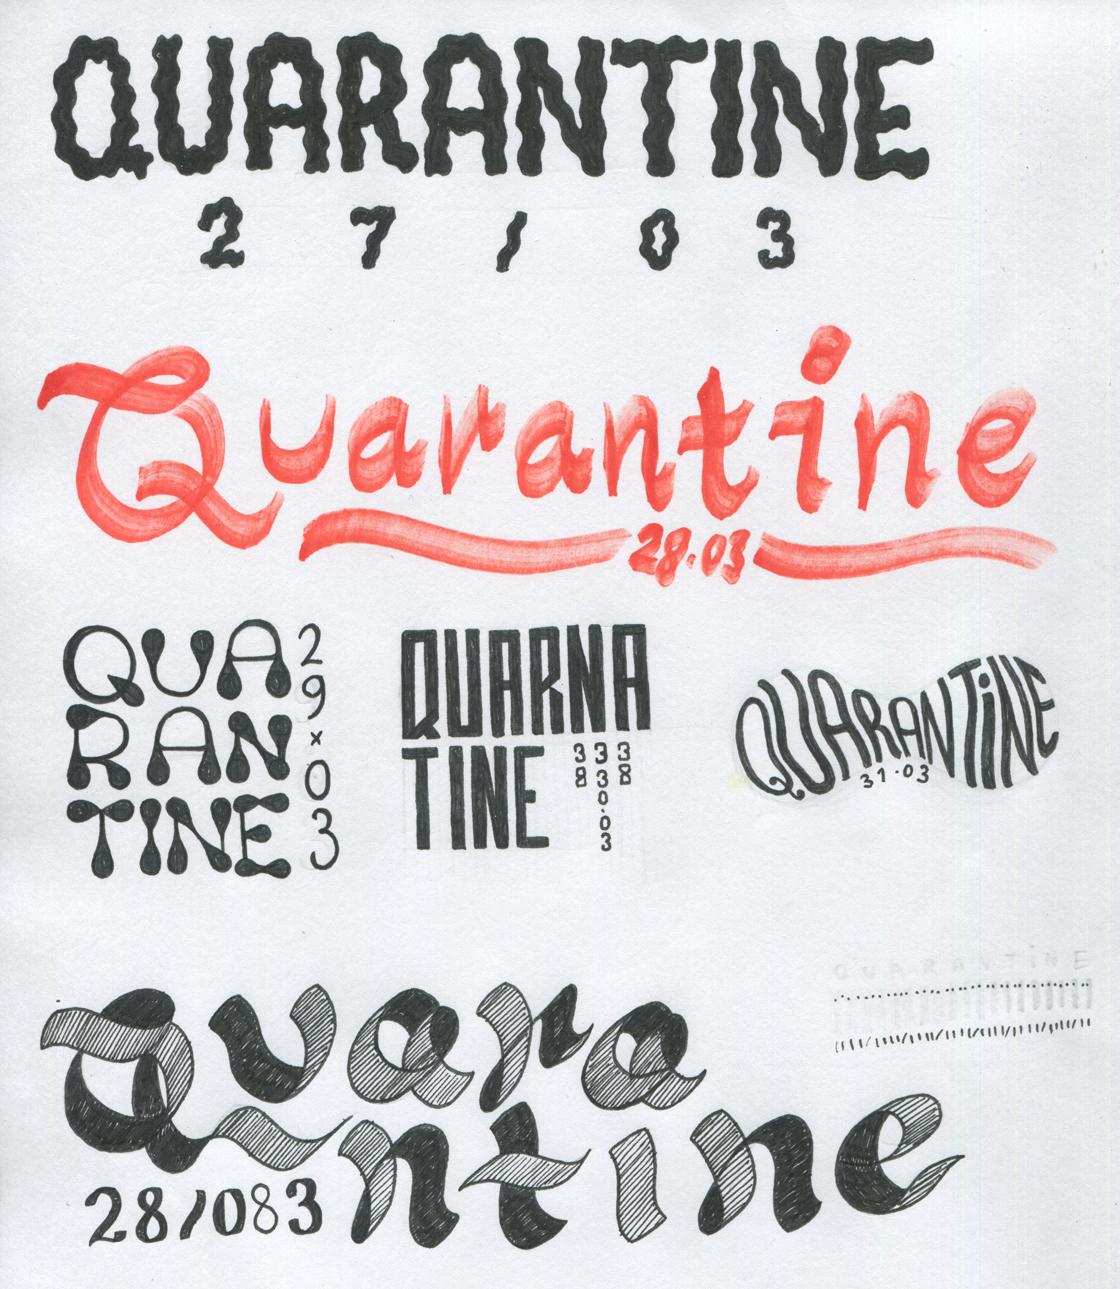 QuarantineScan5